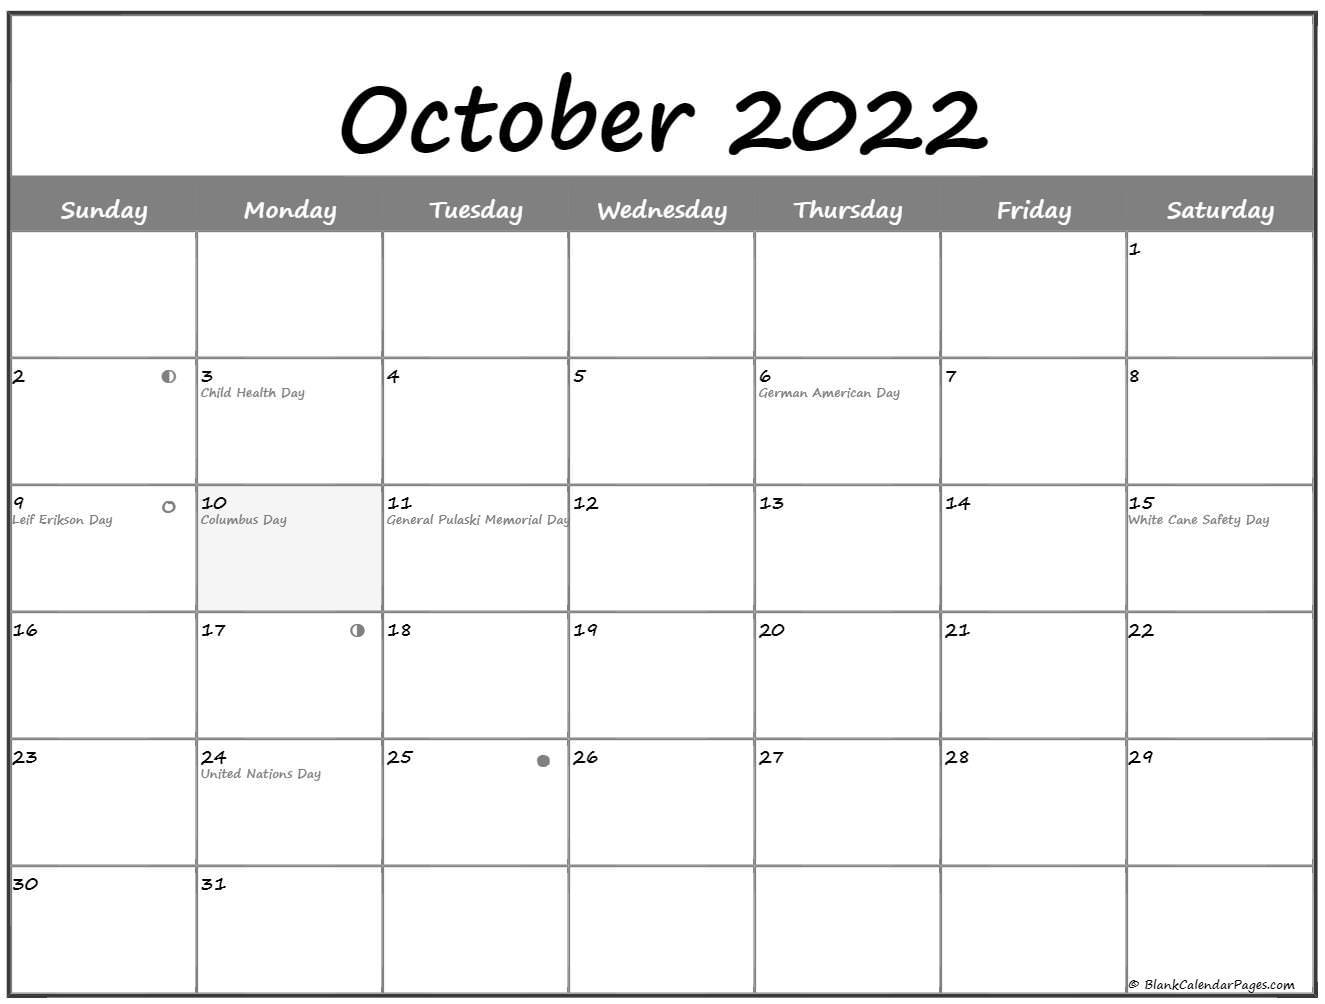 October 2022 Lunar Calendar   Moon Phase Calendar For February March April May 2022 Calendar